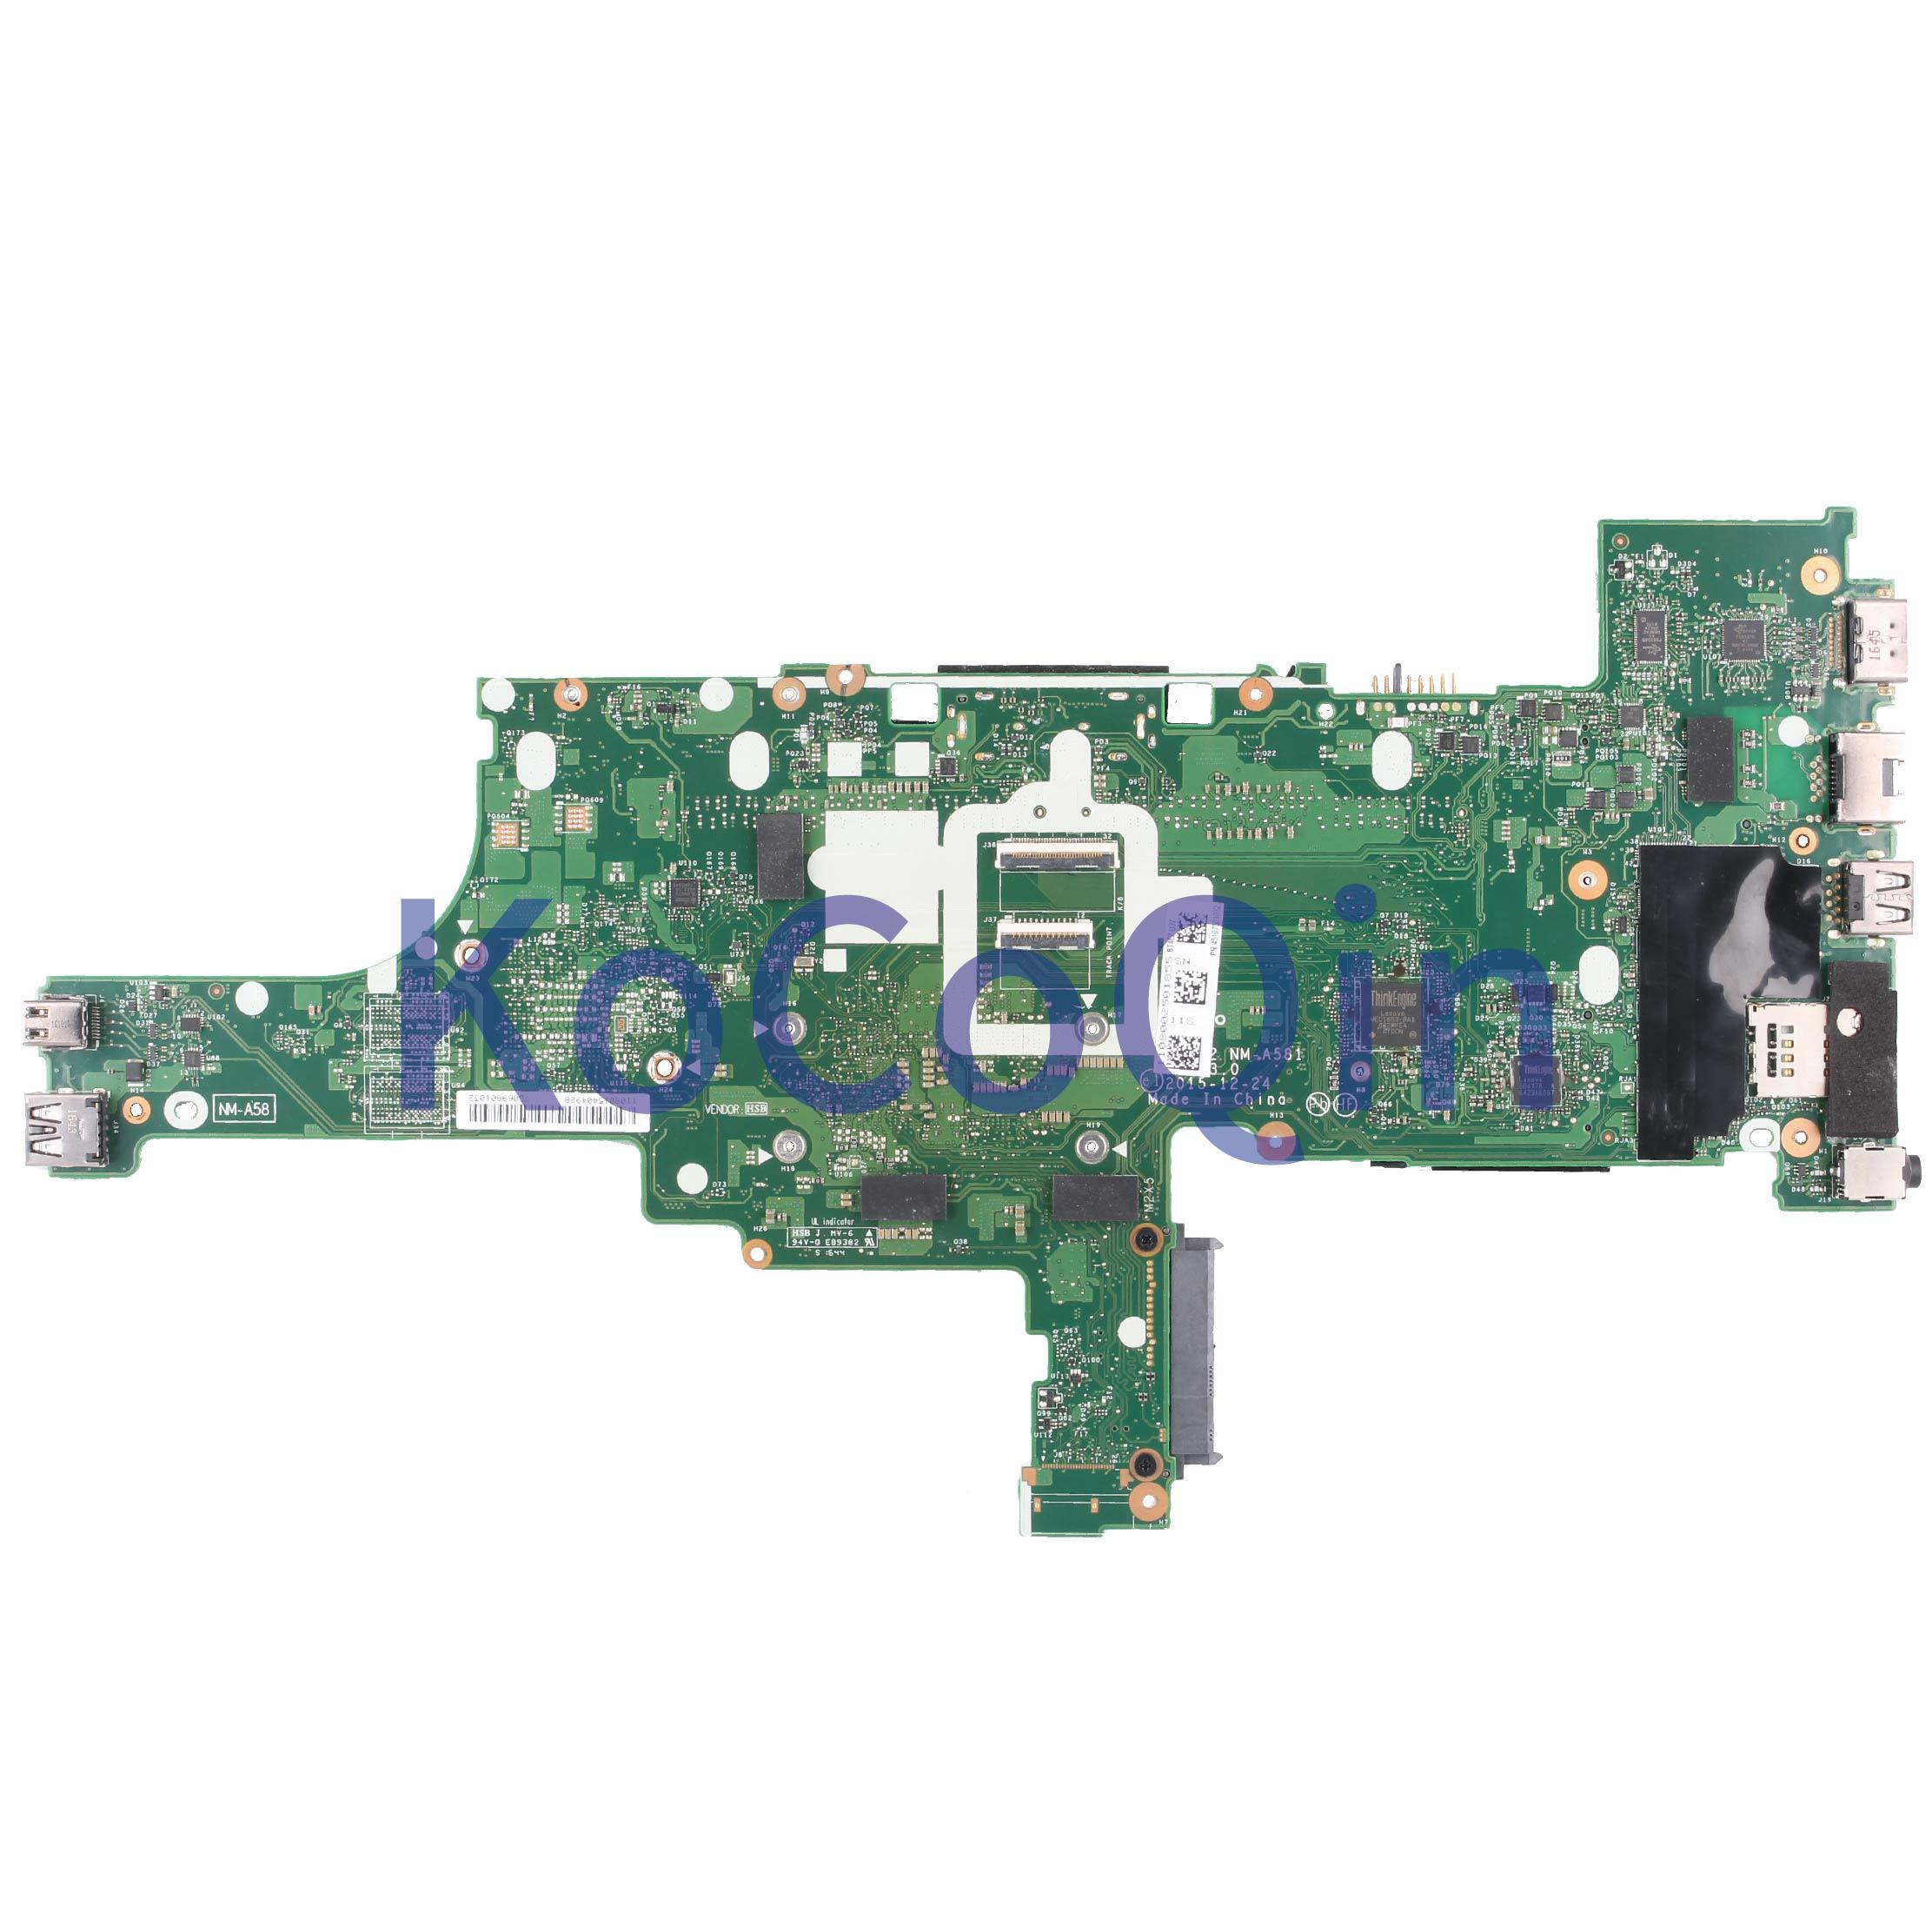 10PCS//set 04X5345 for Lenovo ThinkPad T440 T450 T440S T450S Sim Card Tray Holder